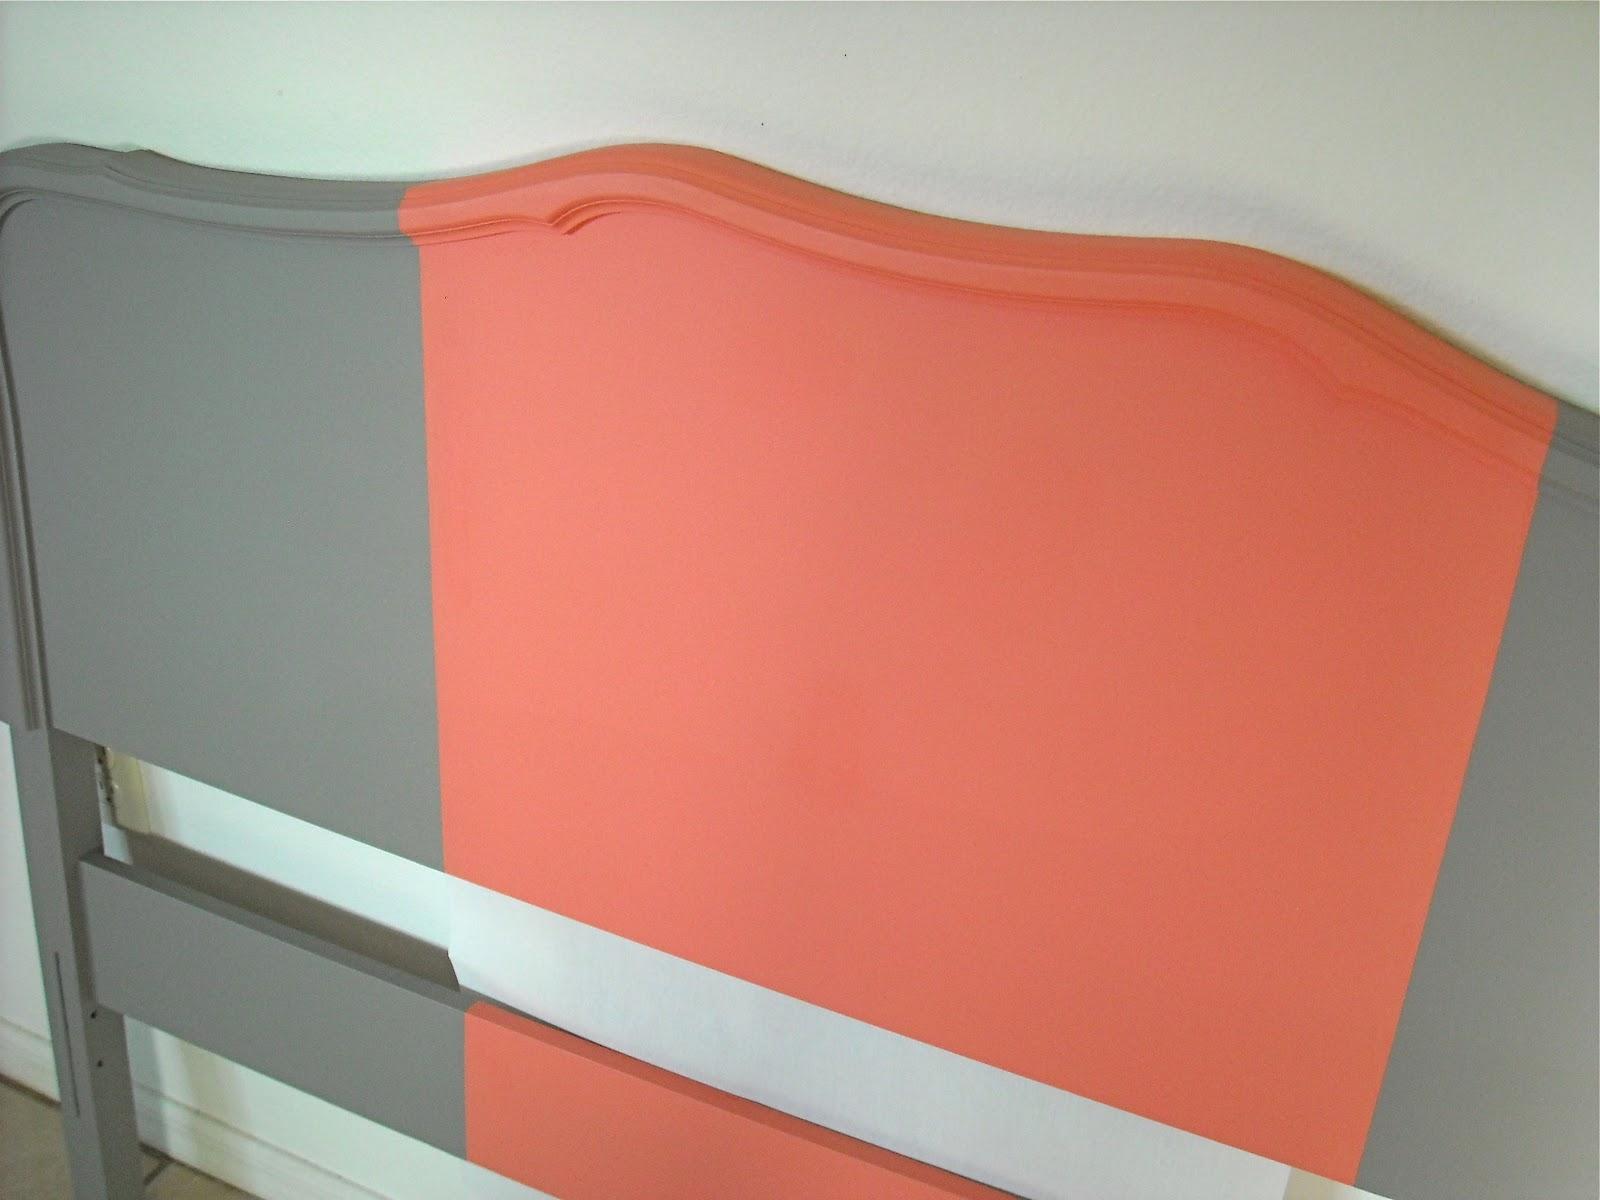 The Maison Studios Coral Striped Headboard